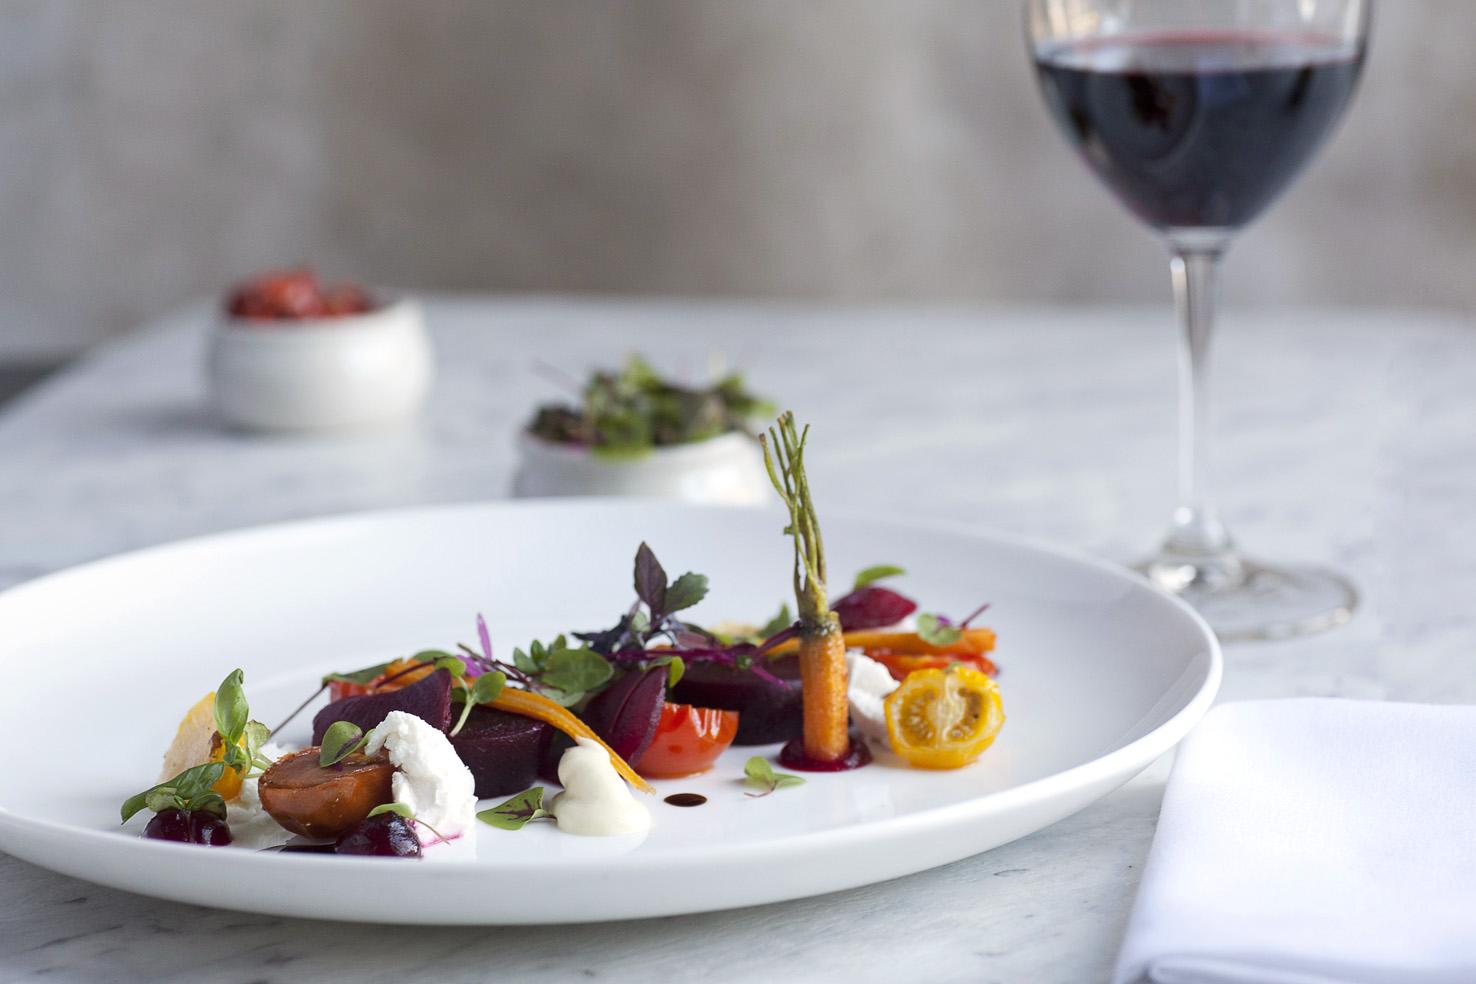 © Fran Flynn for Balthazar Wine & Dine